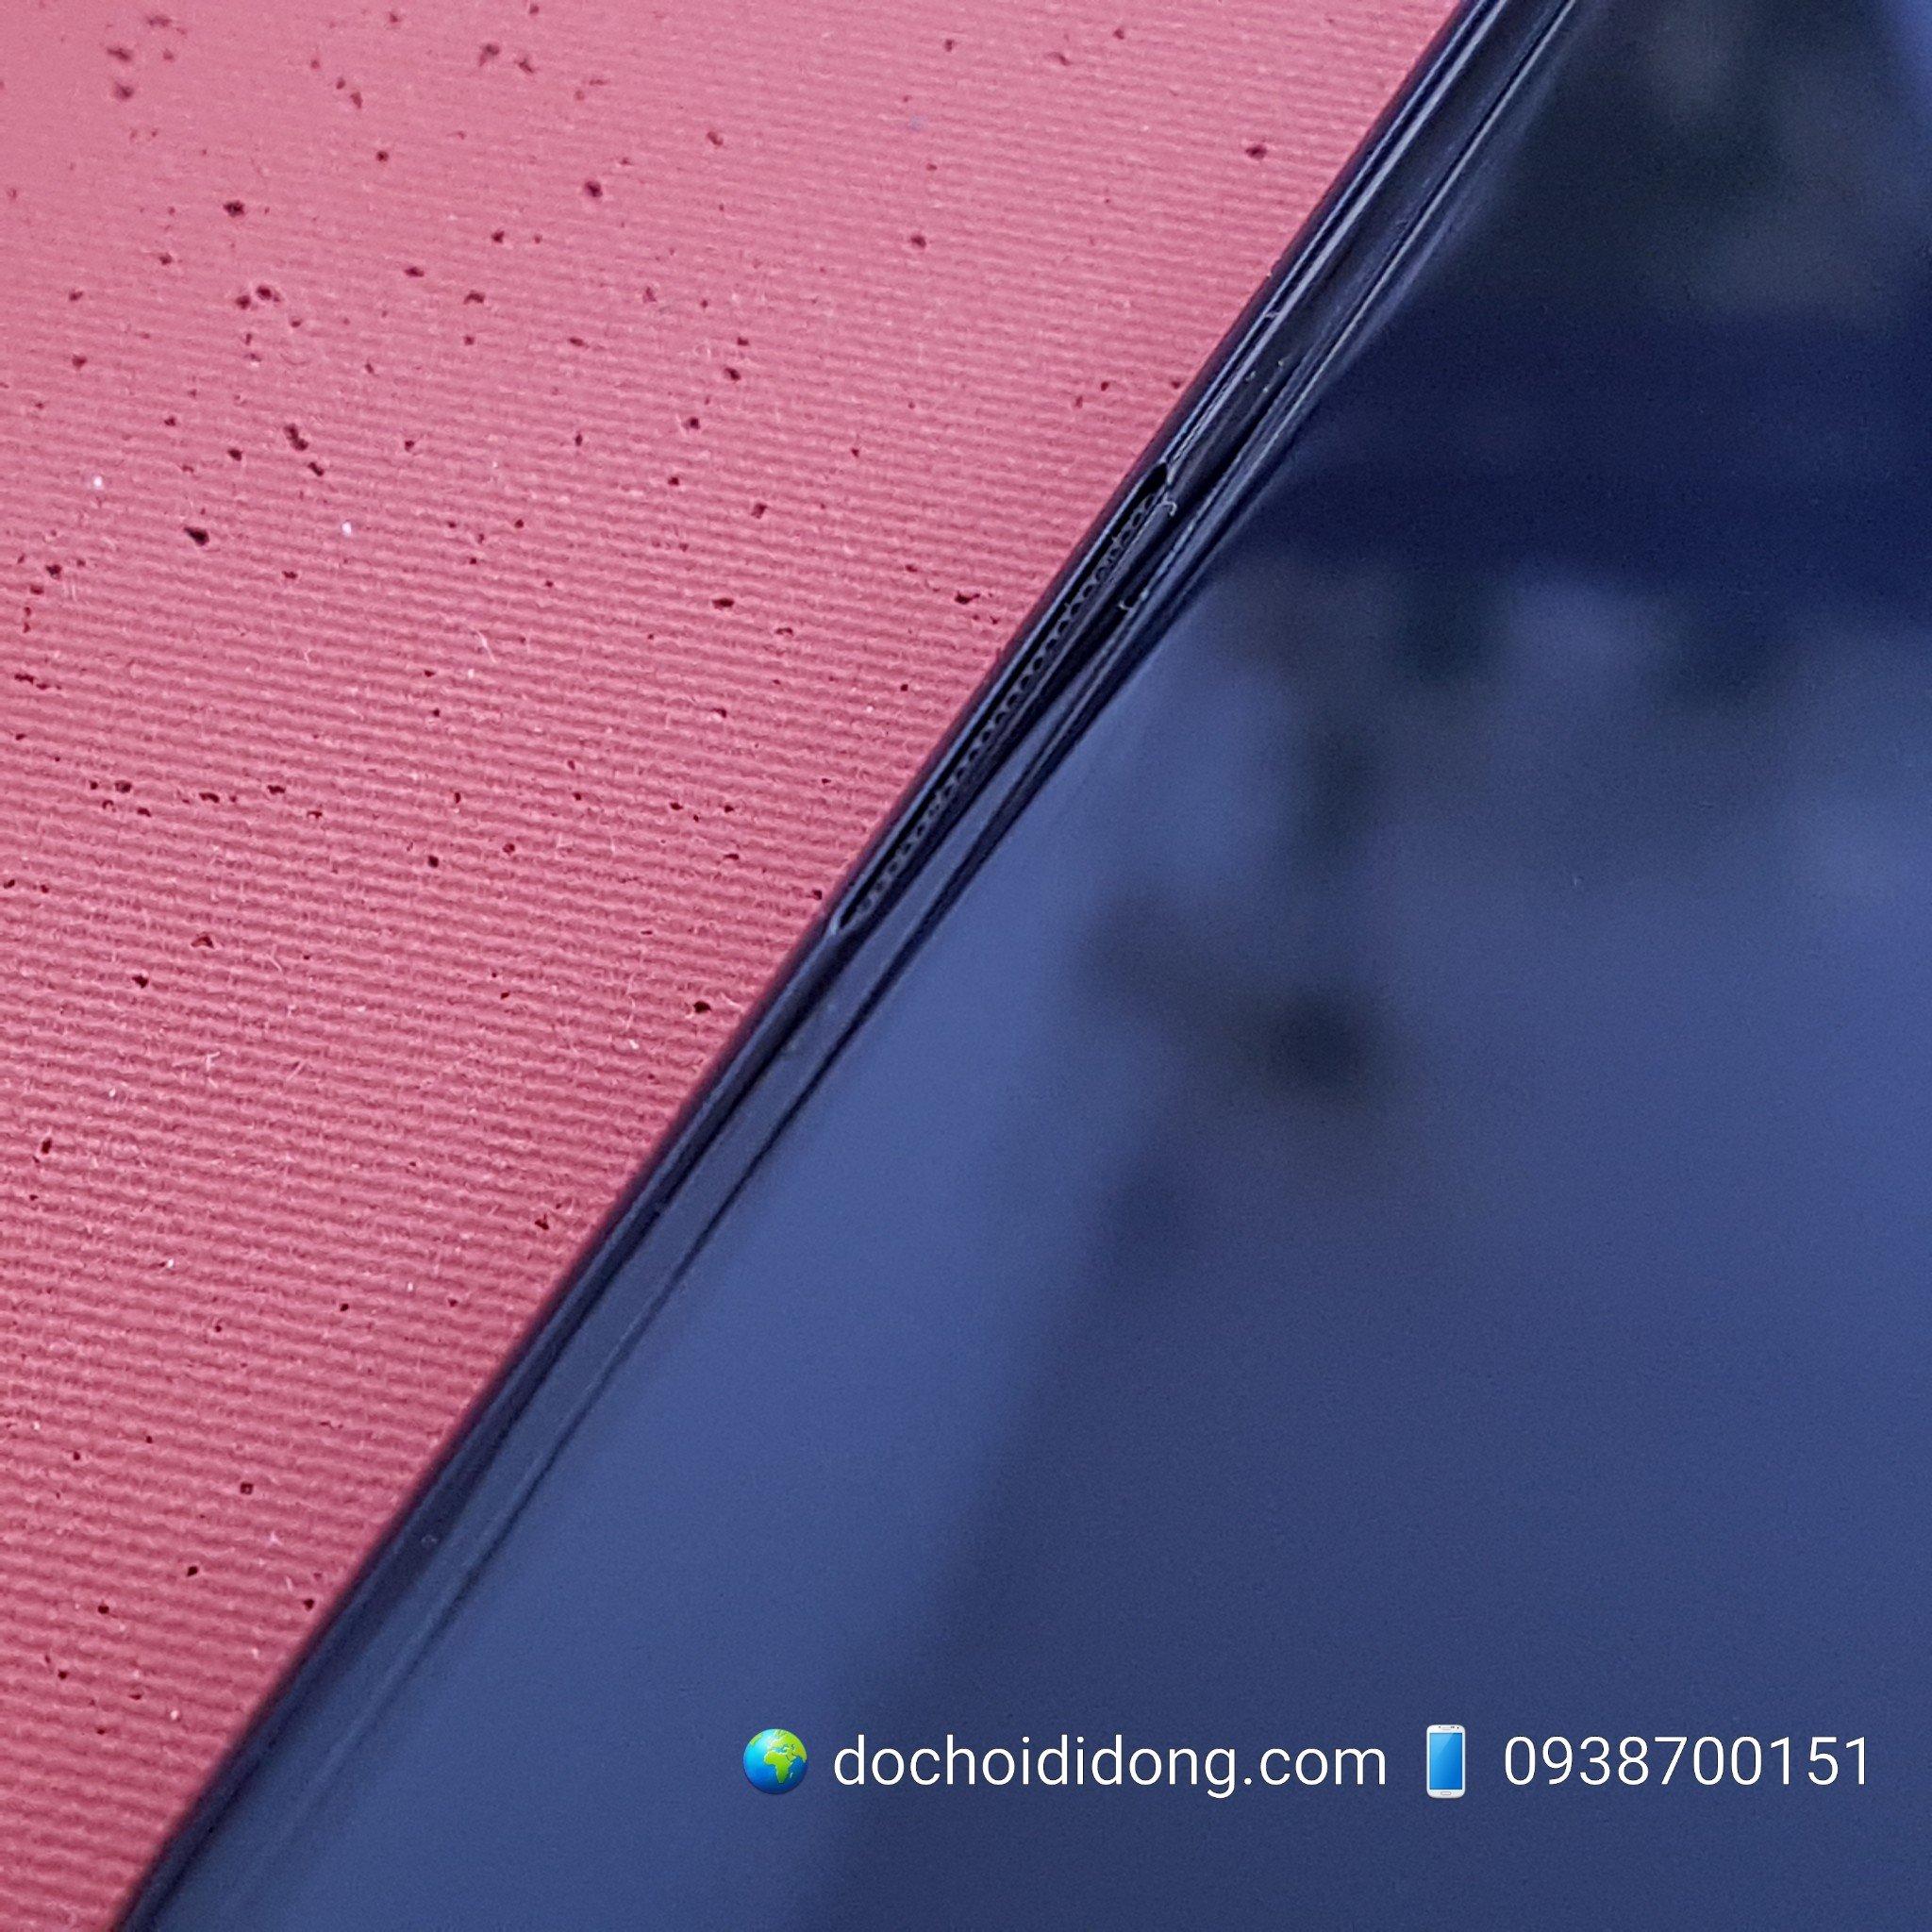 Miếng dán cường lực Xiaomi Redmi K20 Pro Zacase All Clear